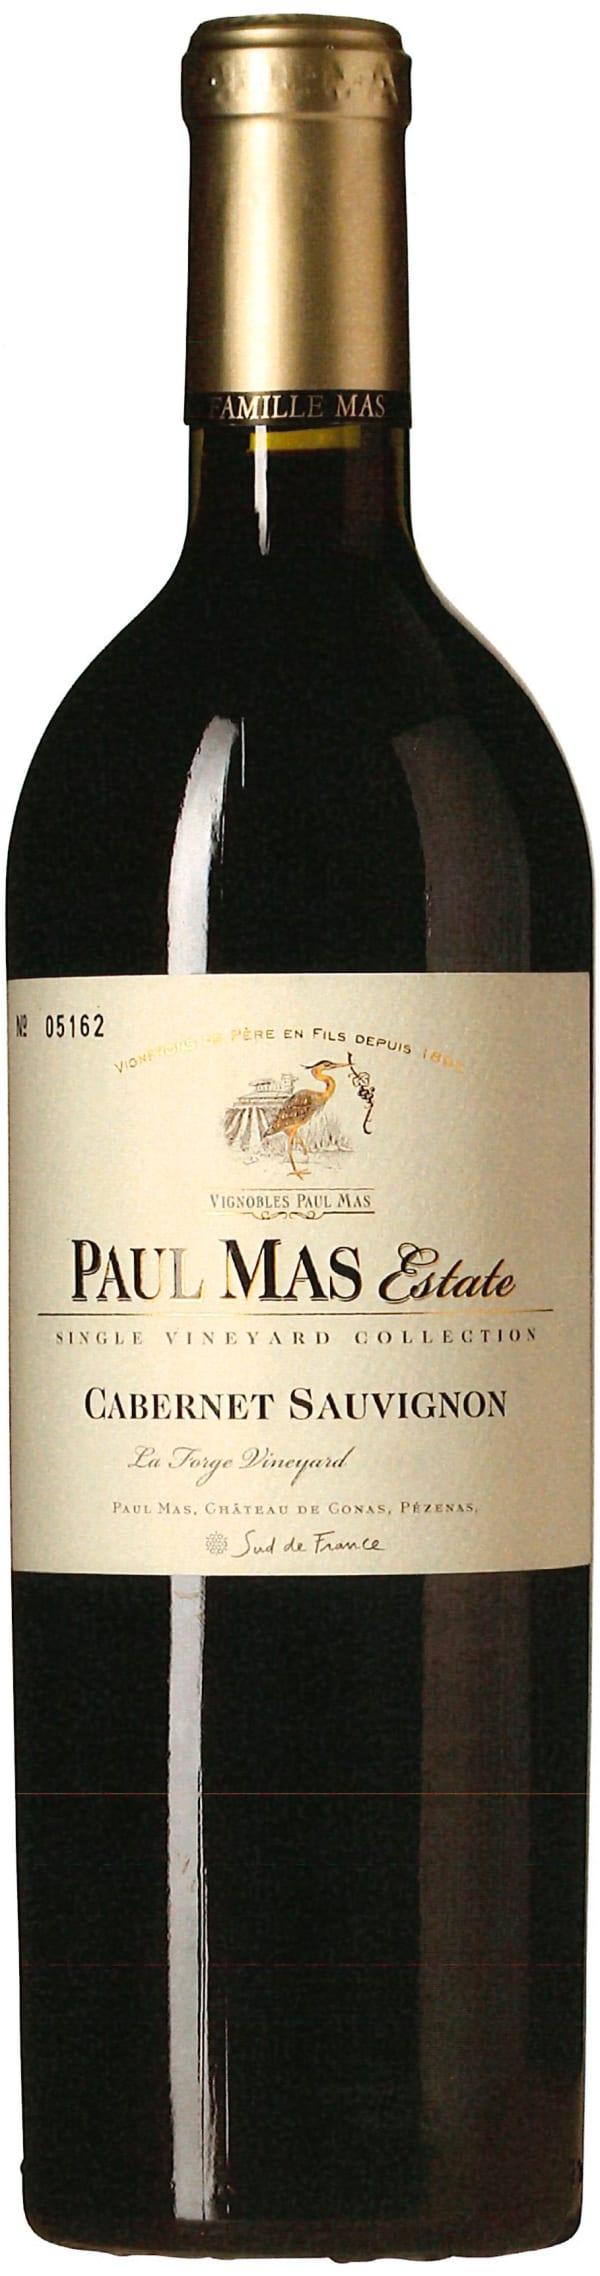 Paul Mas Estate Cabernet Sauvignon 2018